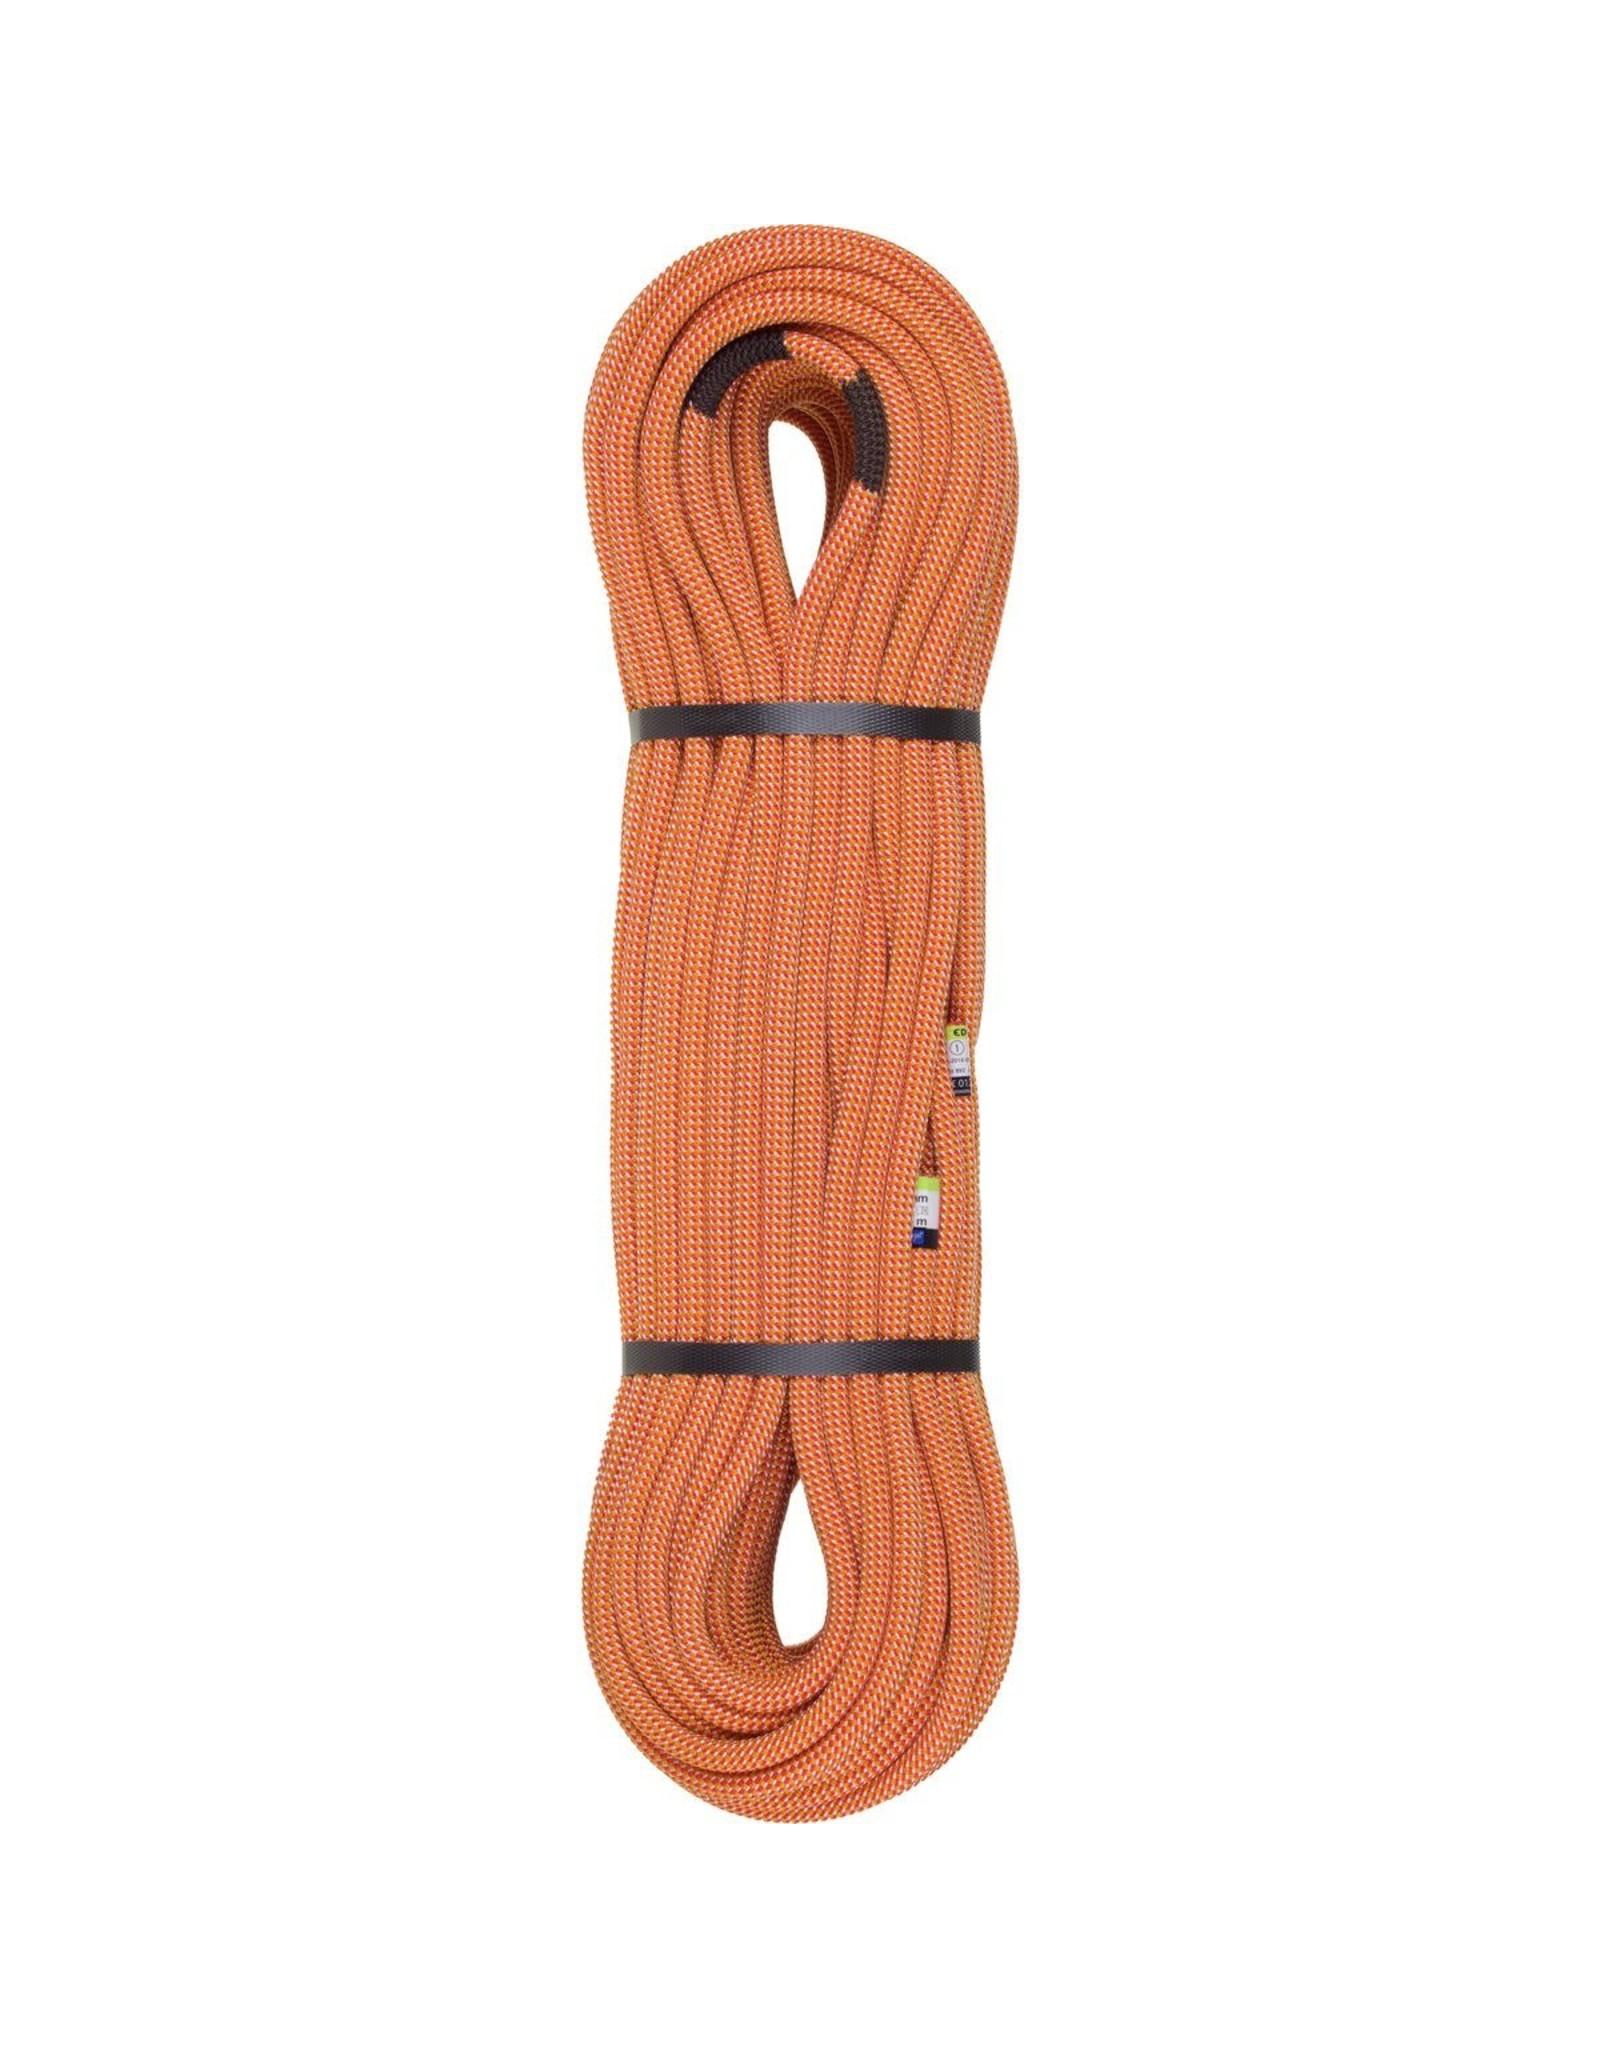 Edelrid Edelrid Boa 9.8 mm Pro Dry  Rope